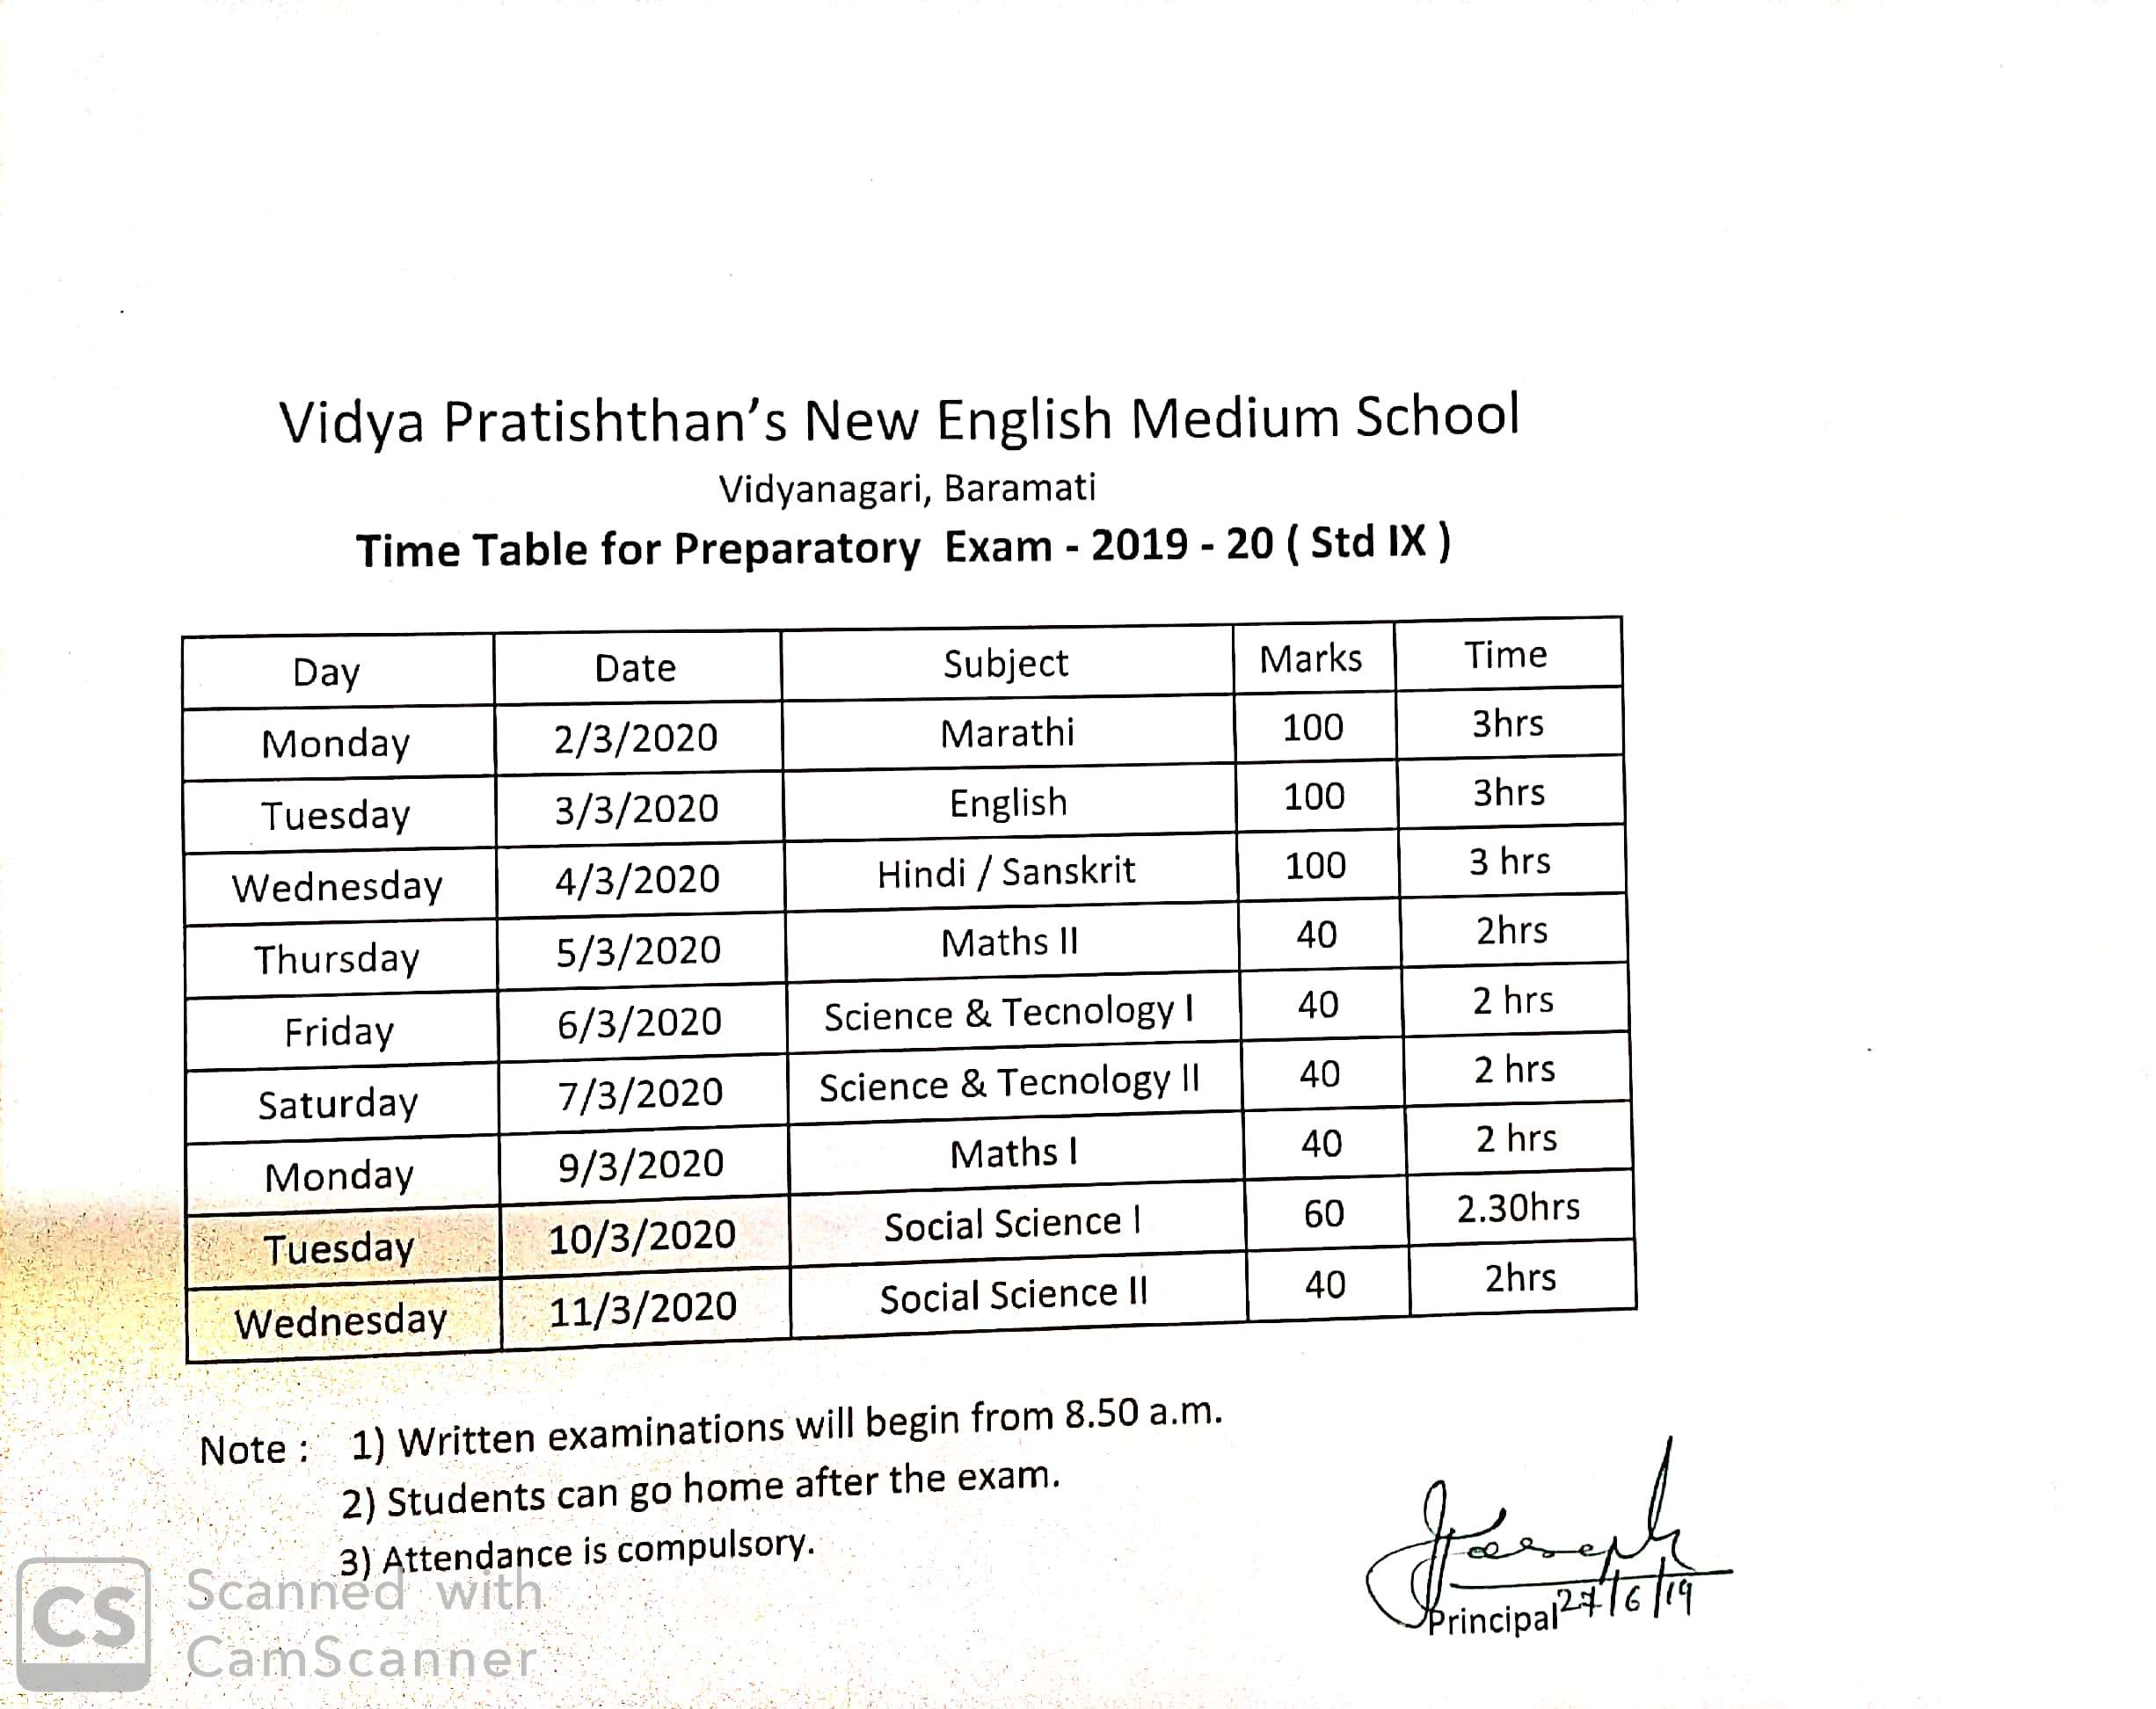 Exam Time Tables 2019-20 – VIDYA PRATISHTHANS NEW ENGLISH